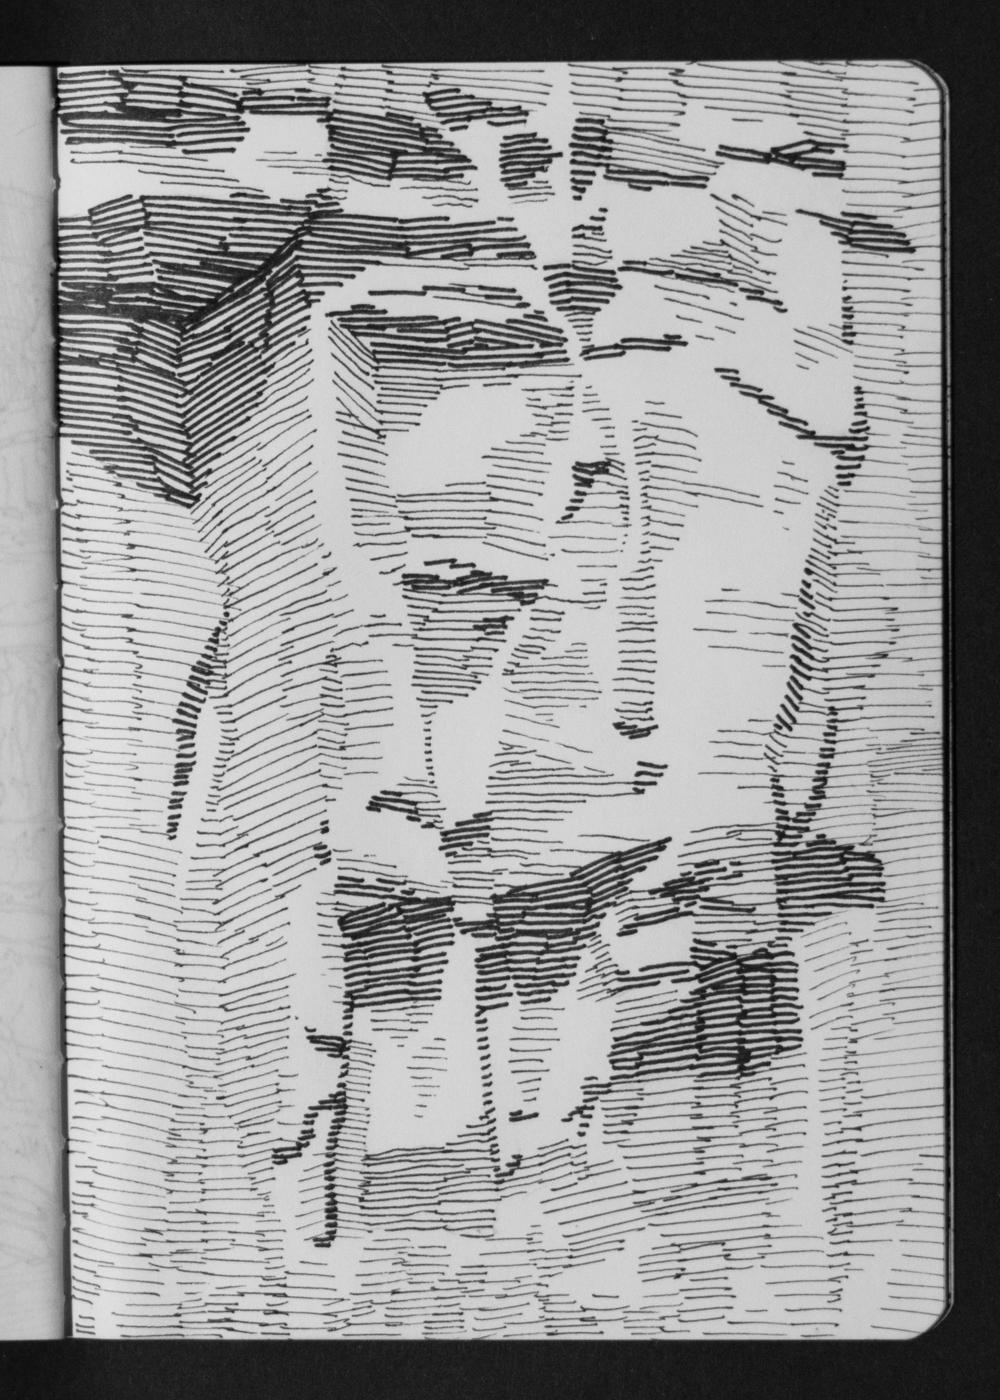 04-18 San Juan Cliff Wall Detail 2.jpg